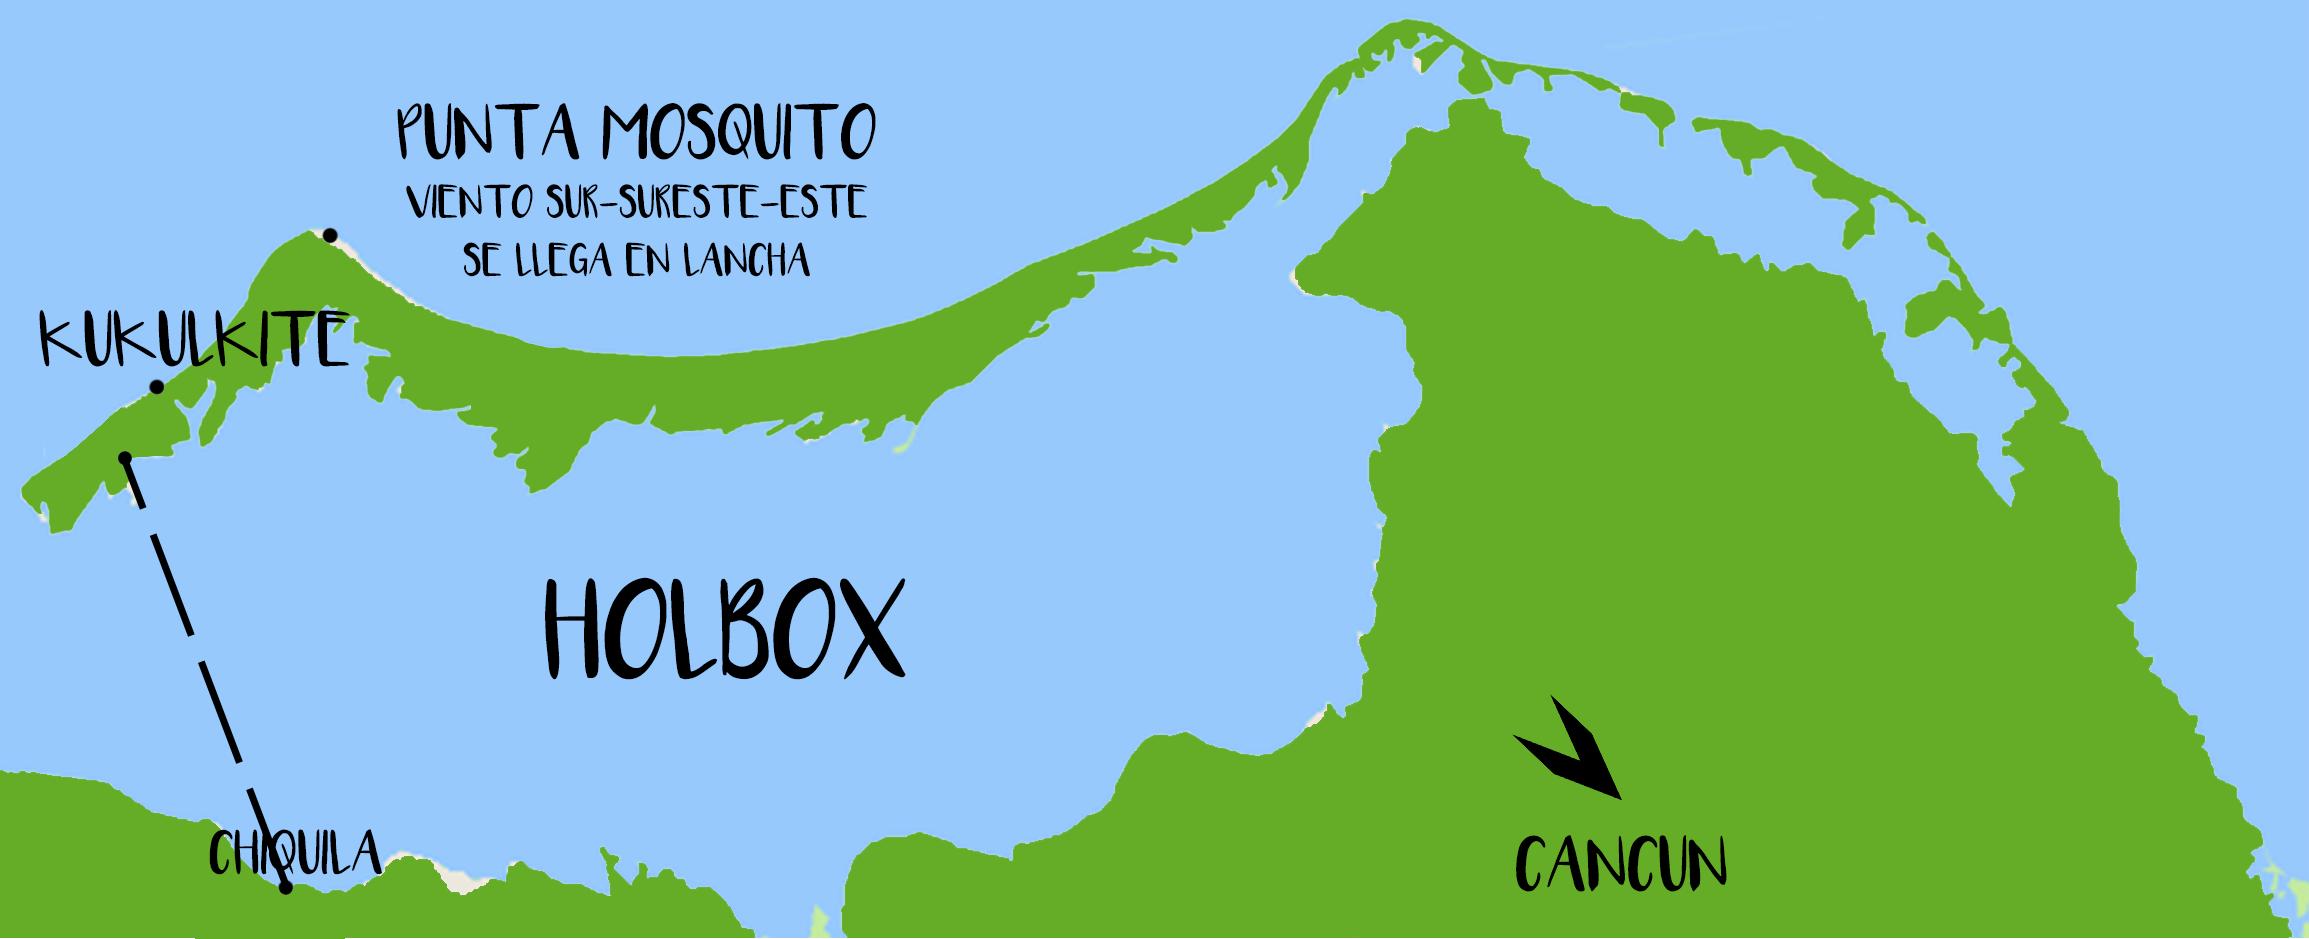 Mappa Holbox Vento